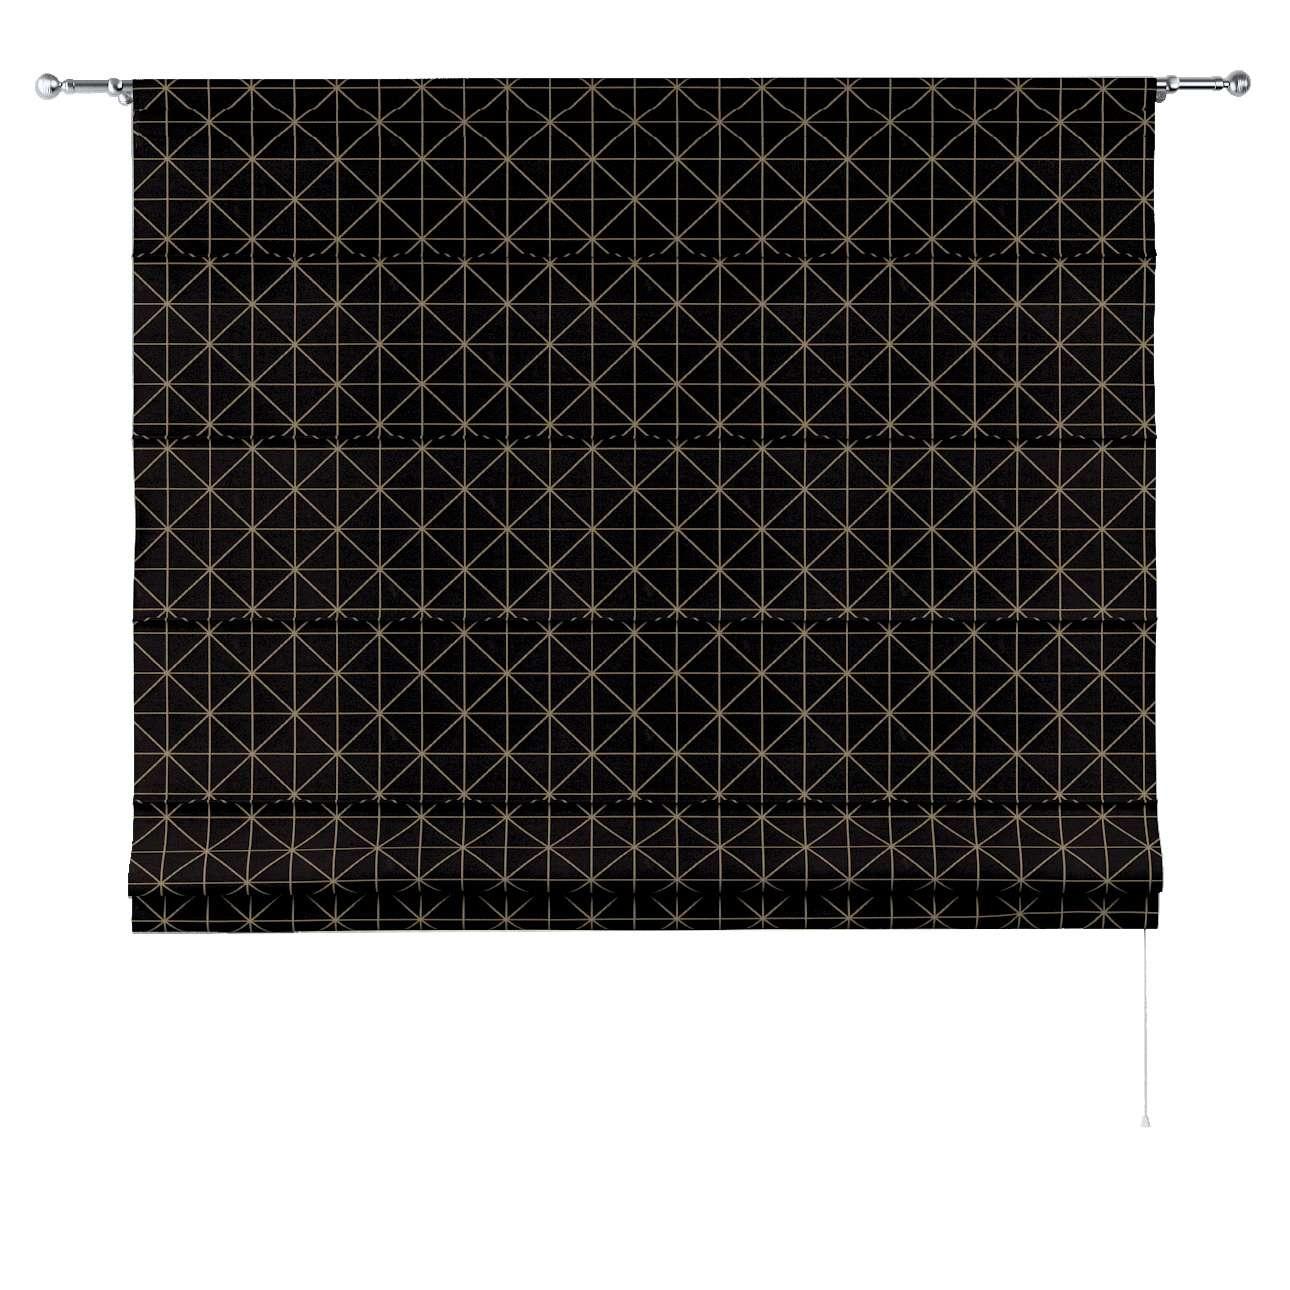 Roleta rzymska Torino w kolekcji Black & White, tkanina: 142-55